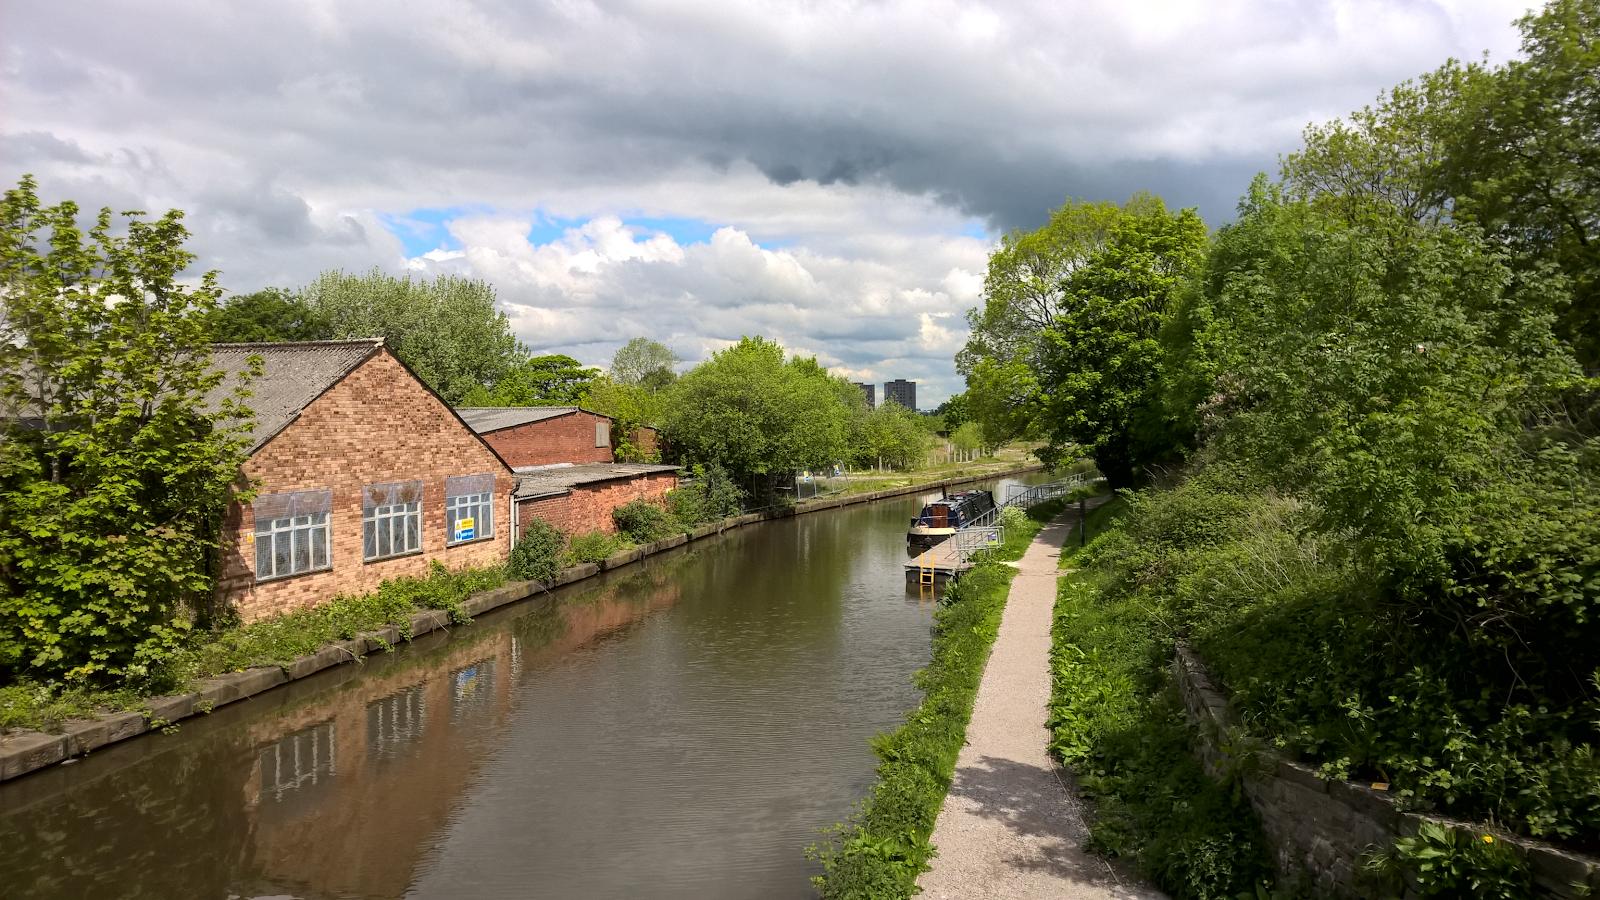 GJW Blog - Narrowboat Route Cheshire Ring